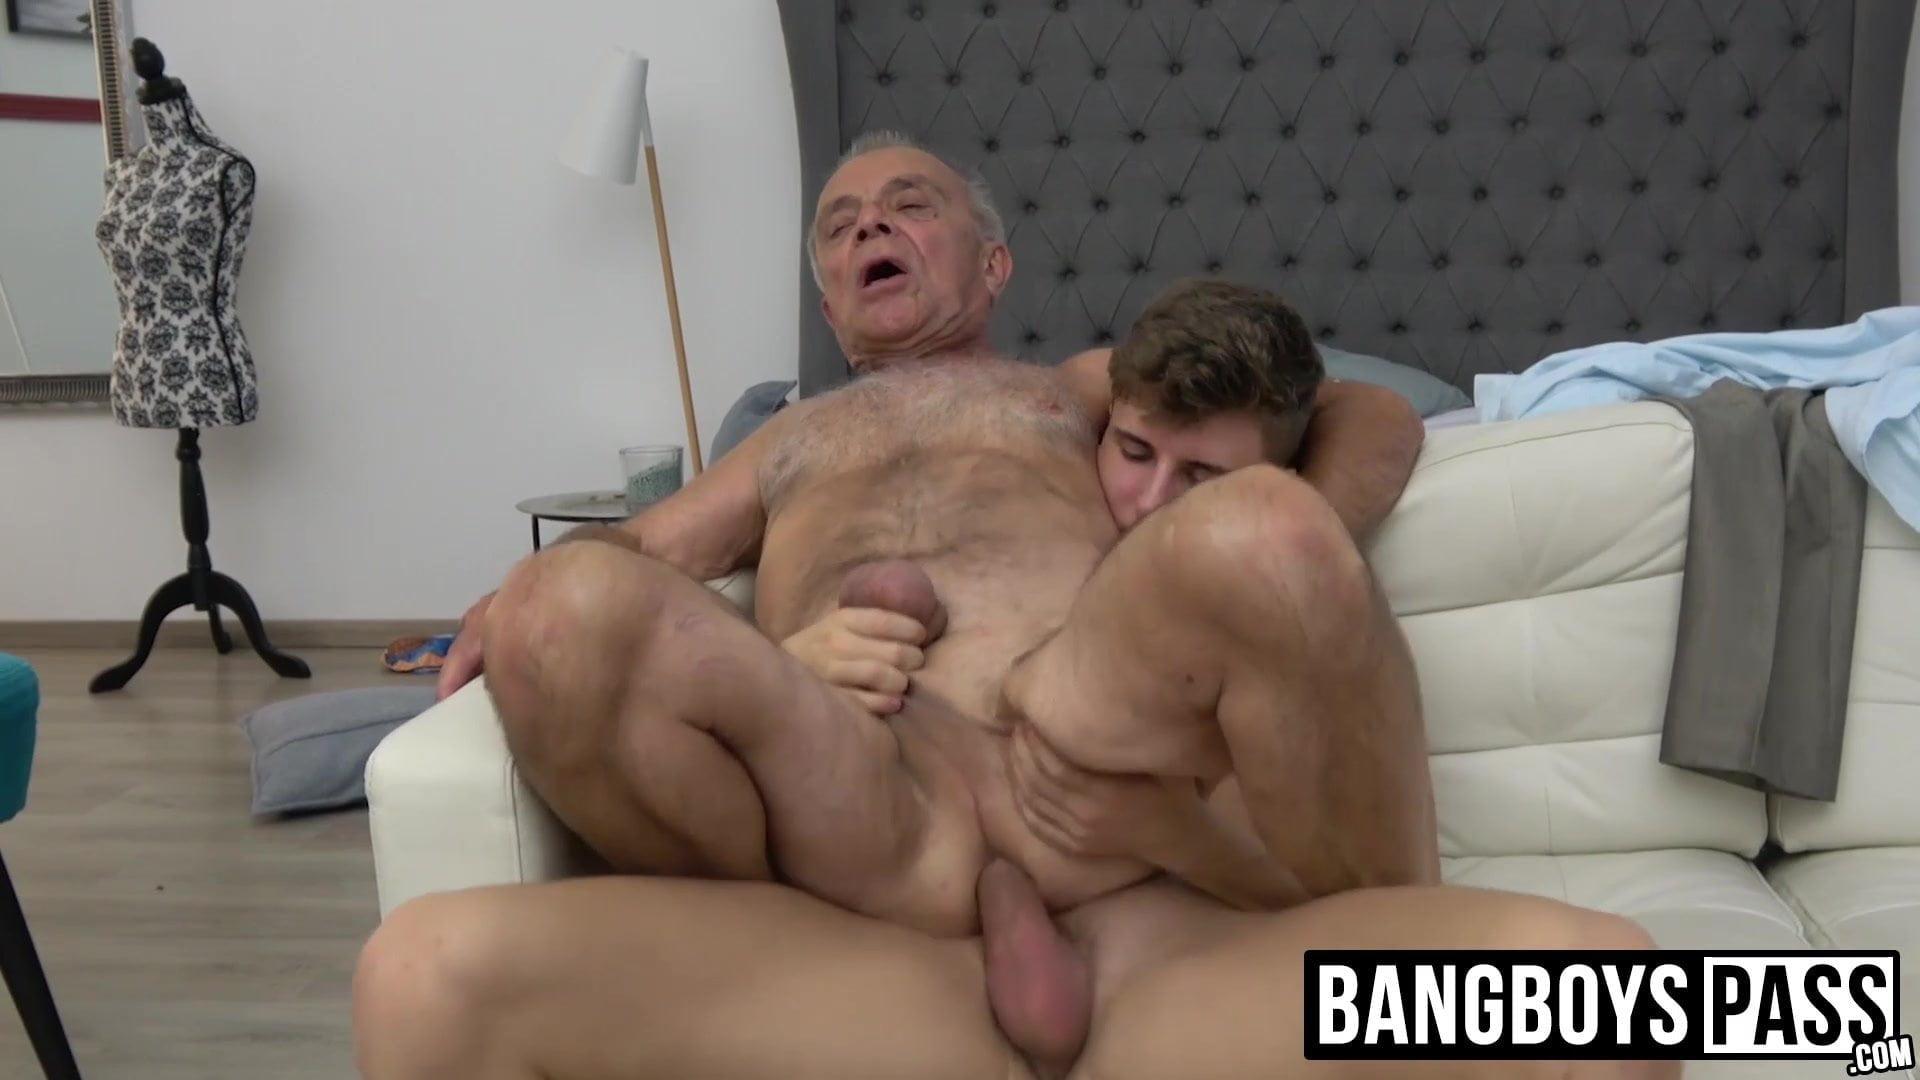 Dirk jager gay porn